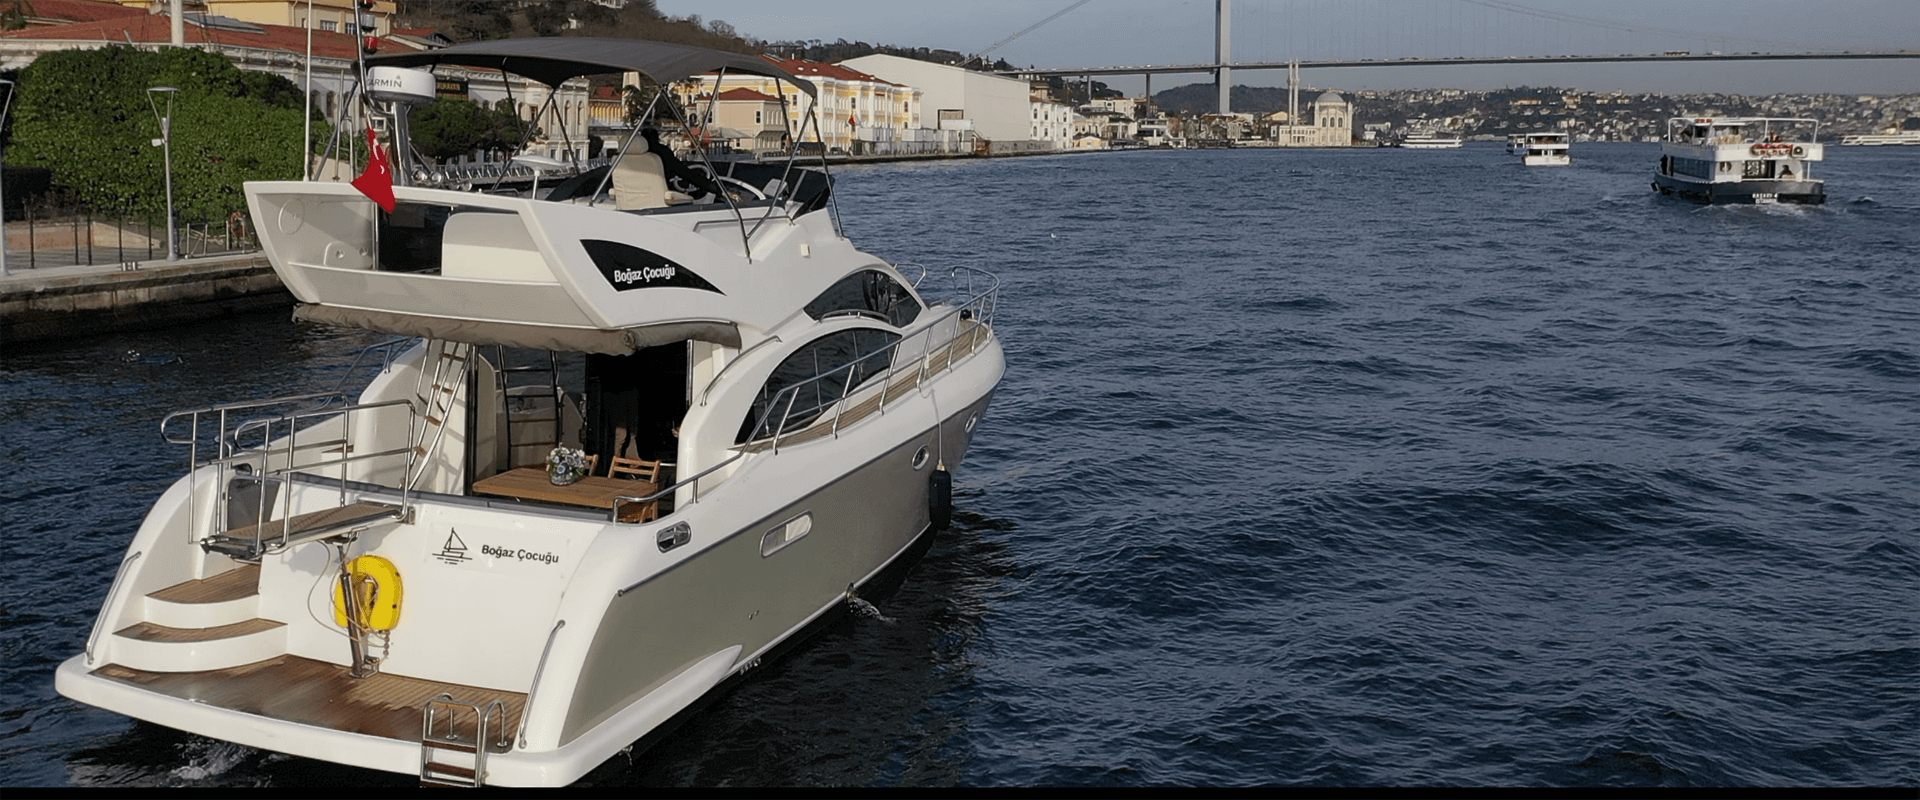 Private Yatch Bosphorus Cruise Tour